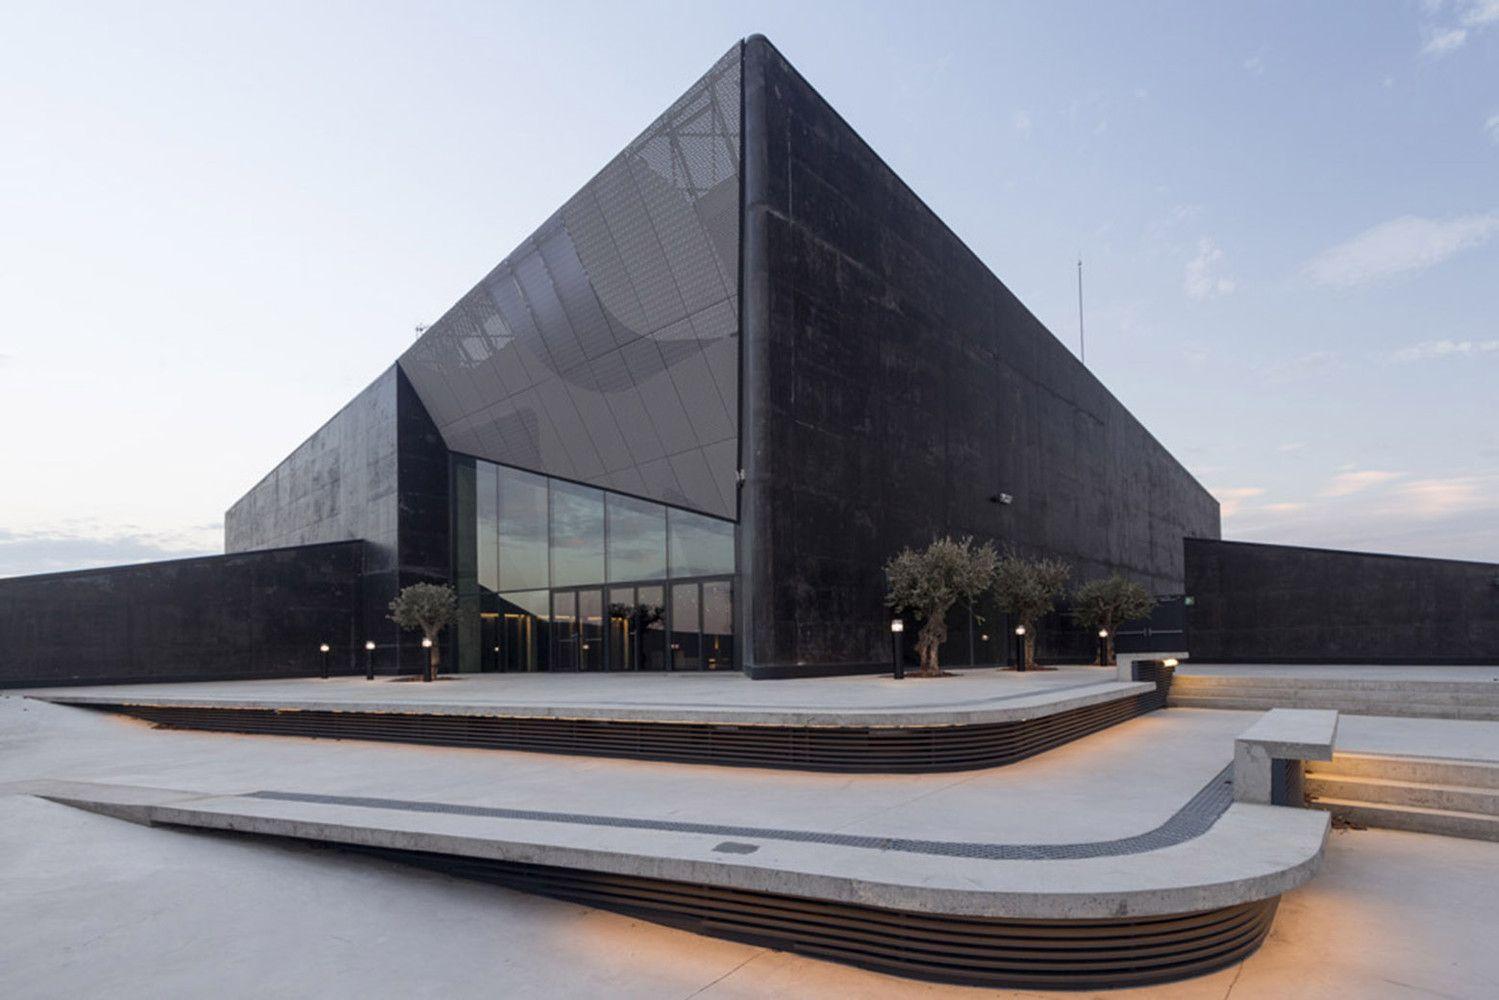 Gallery of CaixaForum Zaragoza / Estudio Carme Pinós – 7